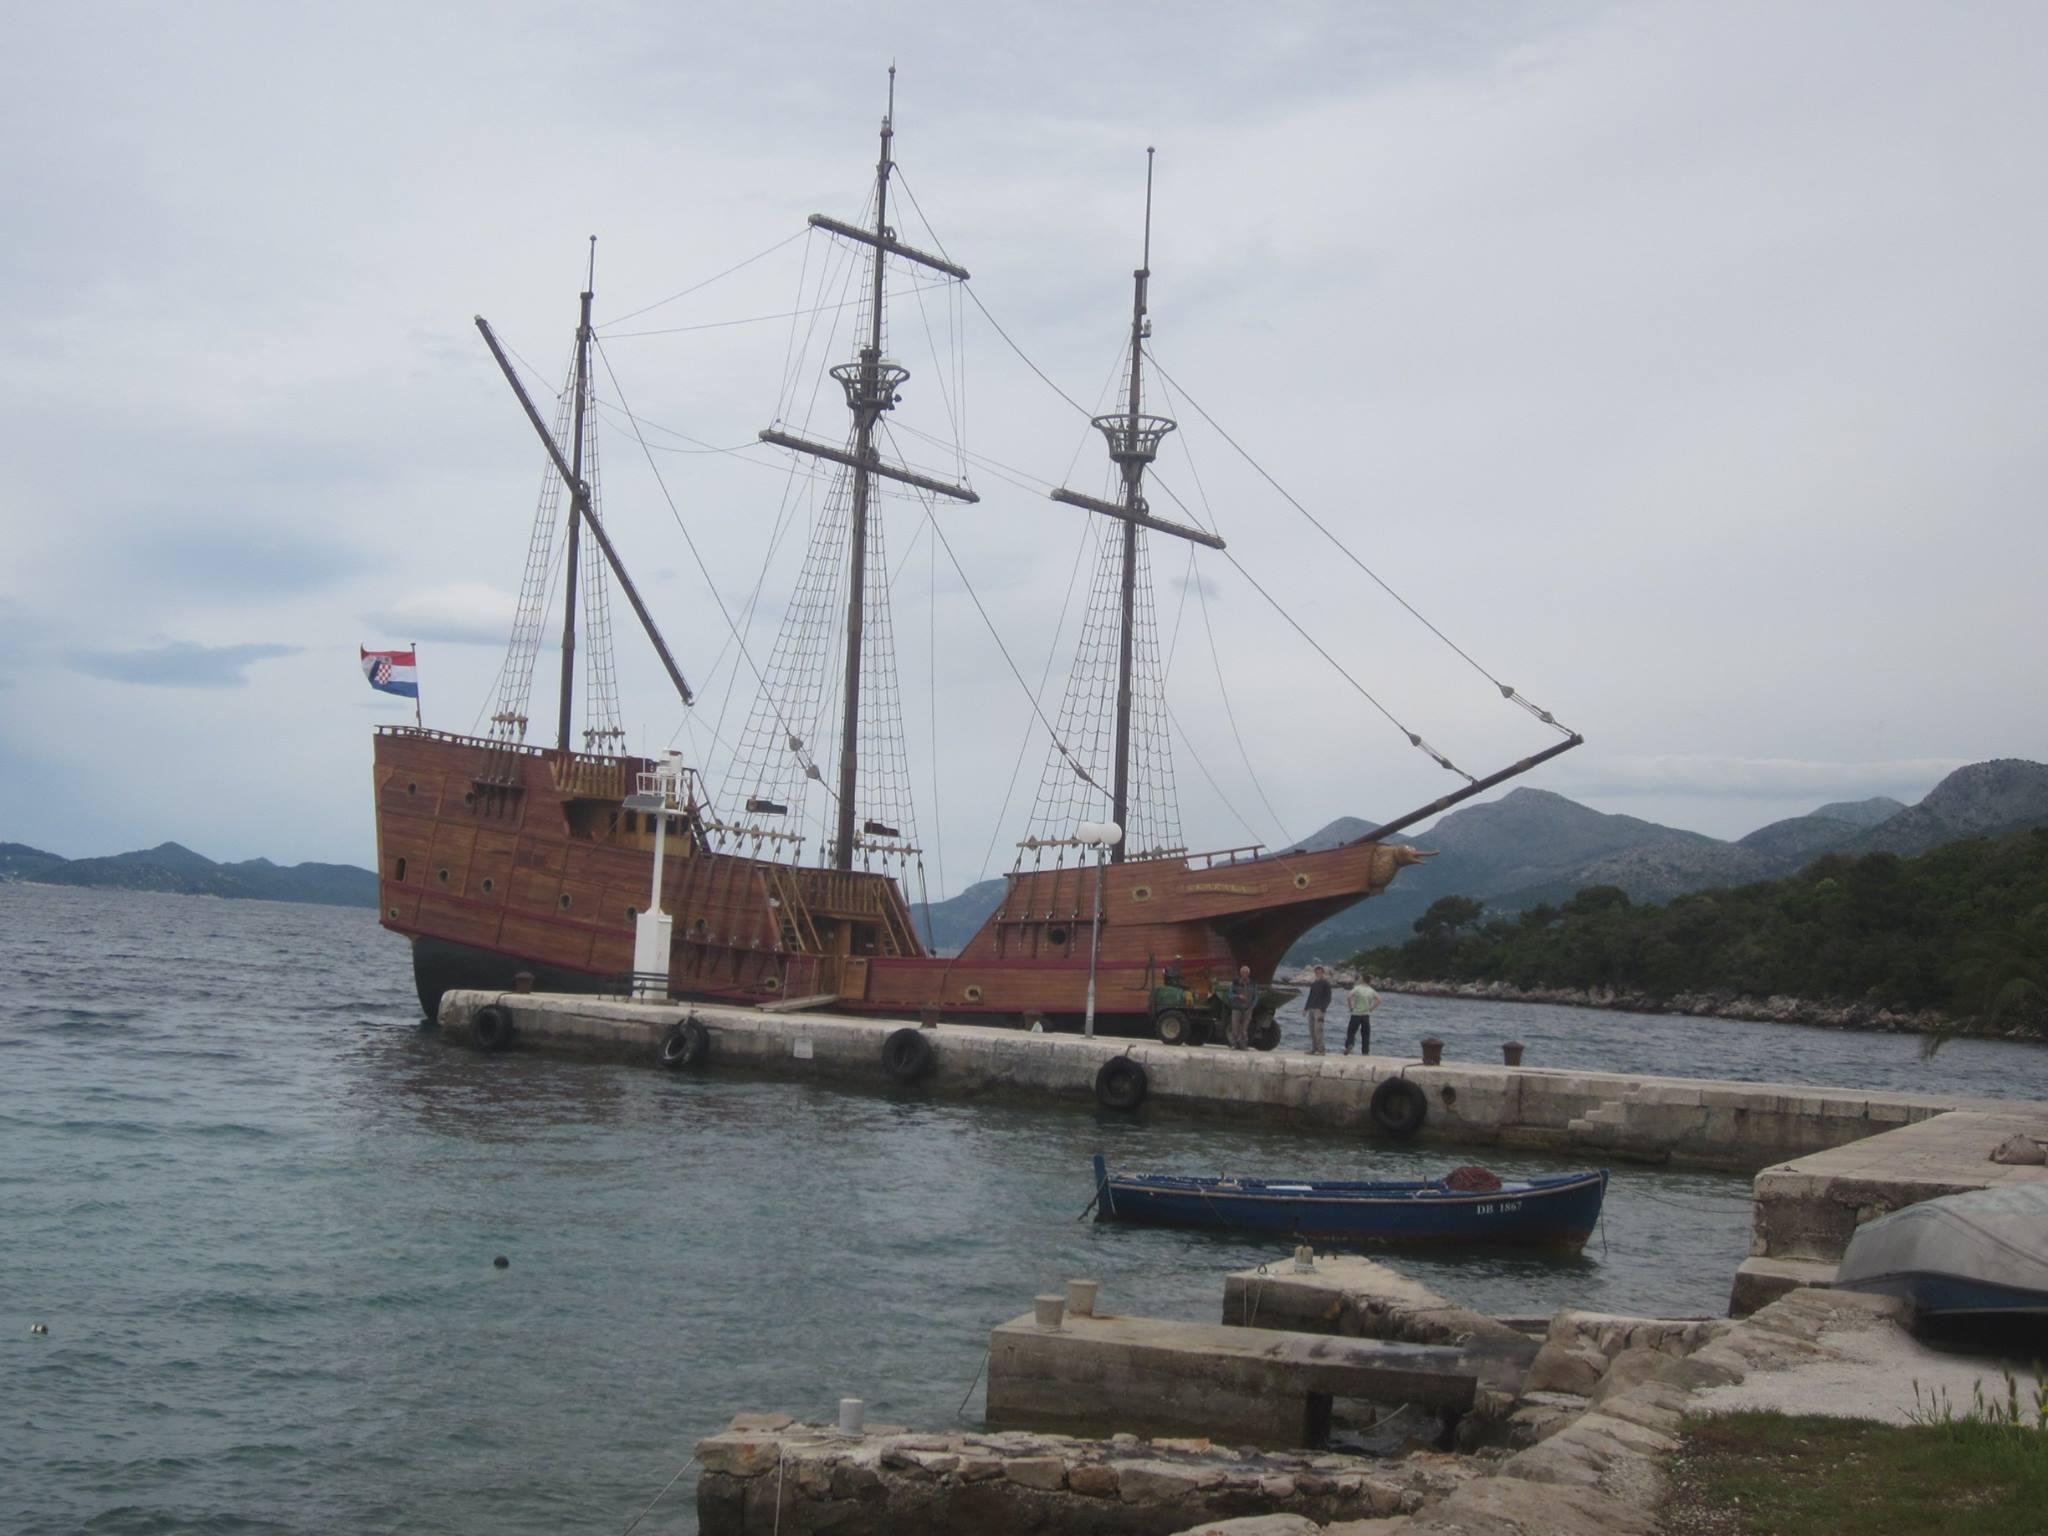 SECRD 11 Dubrovnik & the Dalmatian Coast